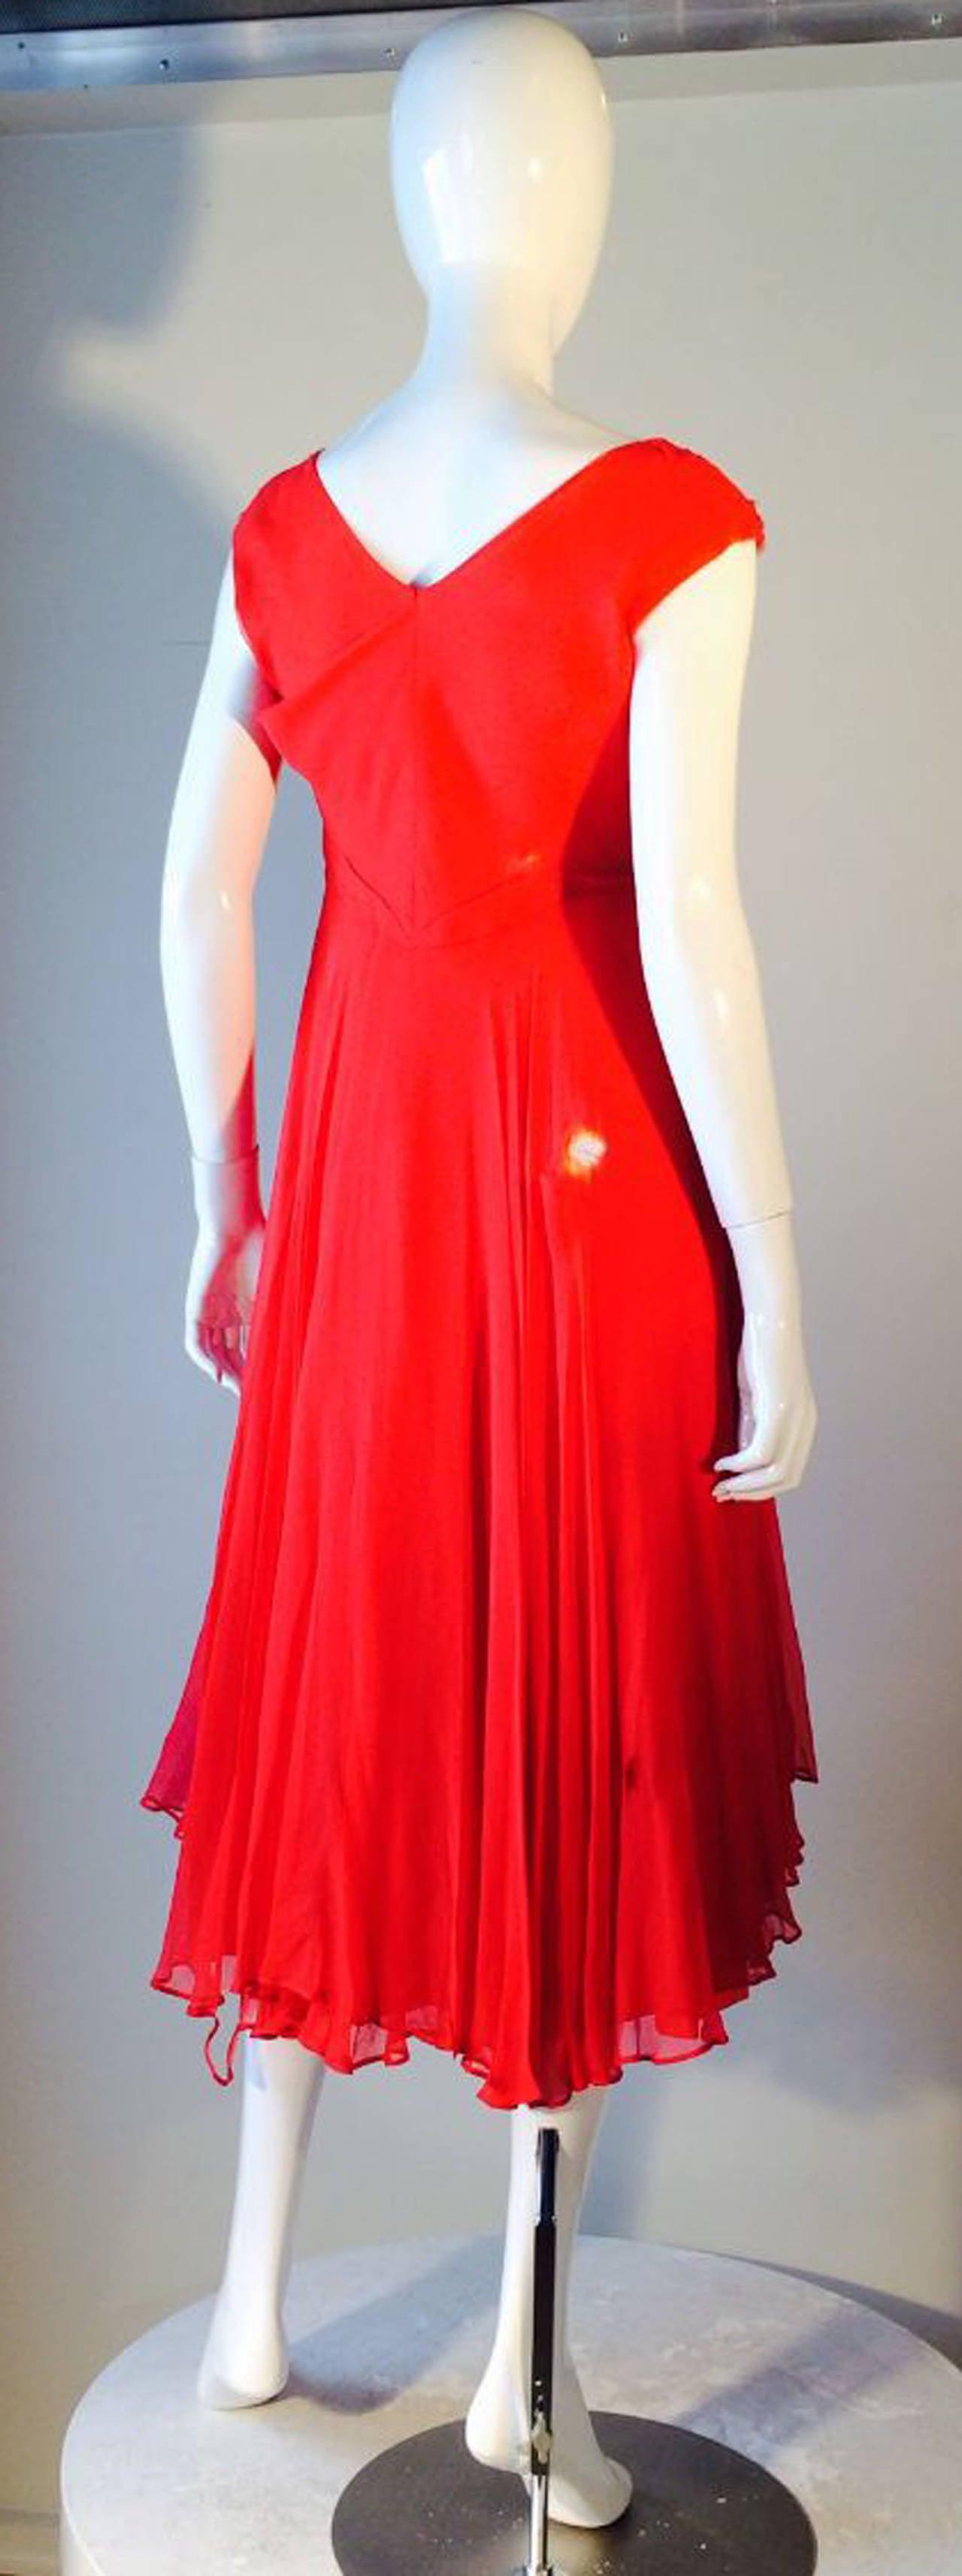 jackie kennedy evening dresses - photo #33